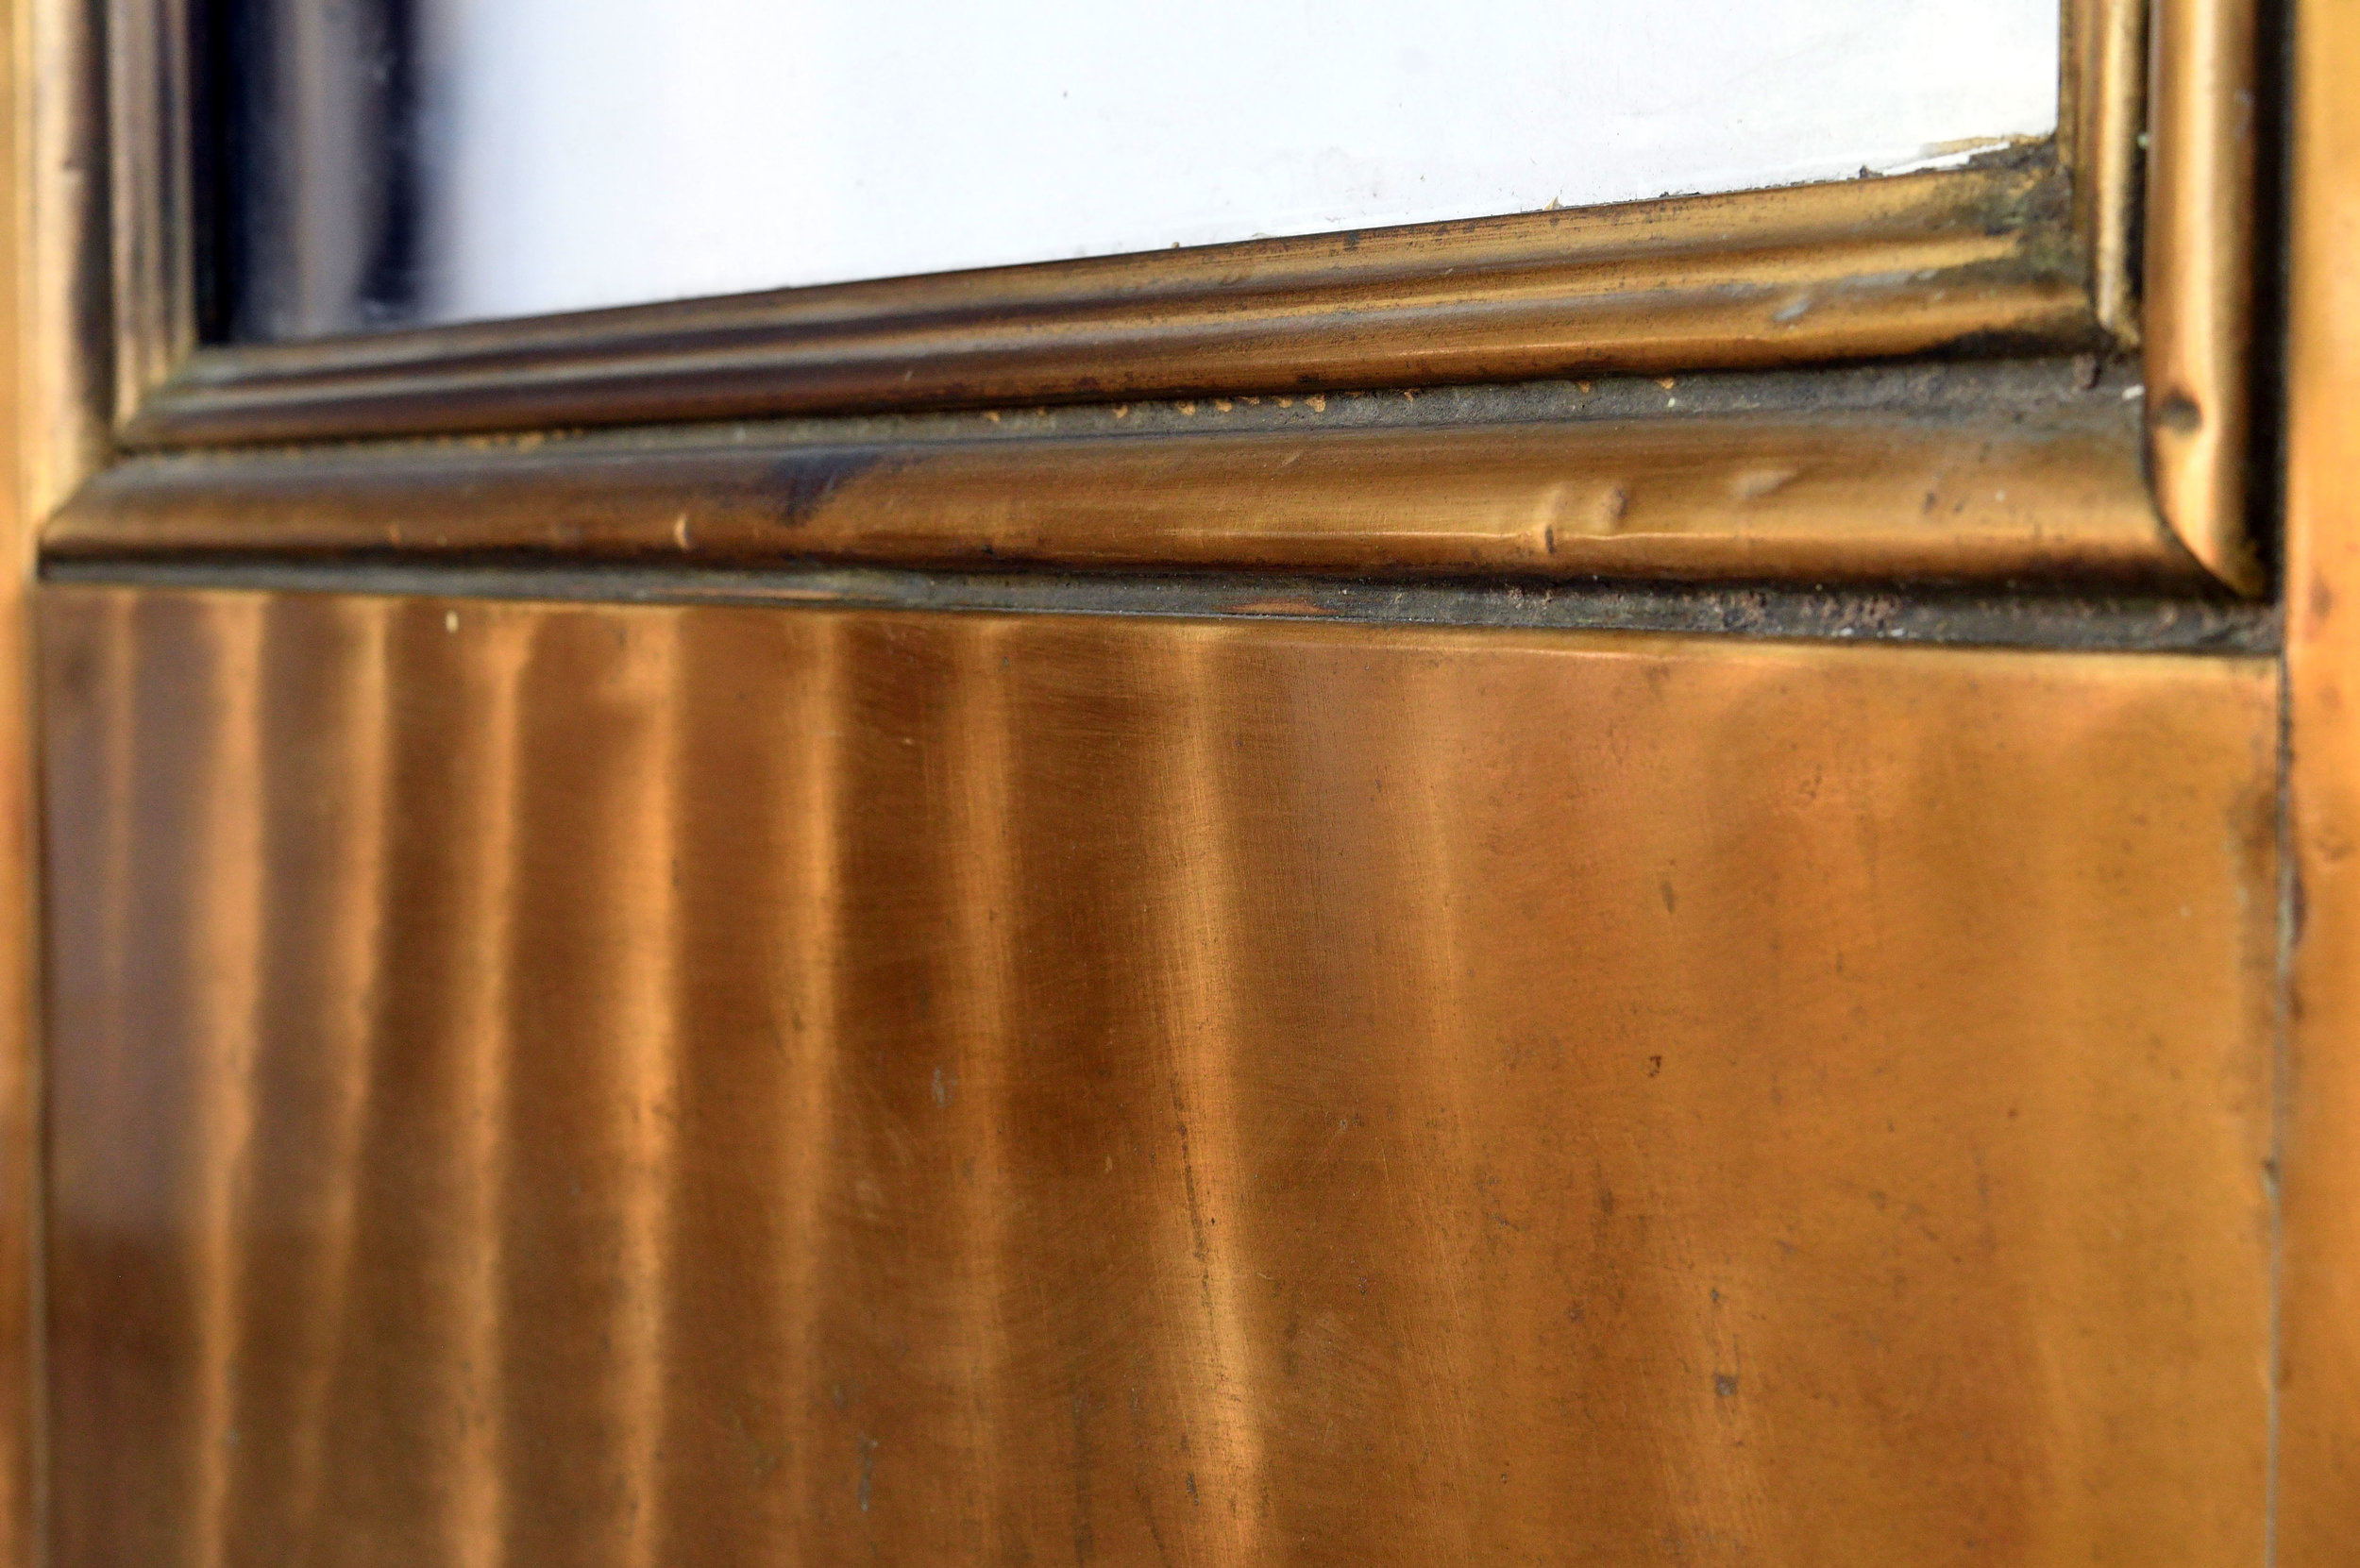 47865-brass-clad-doors-rippling-metal.jpg